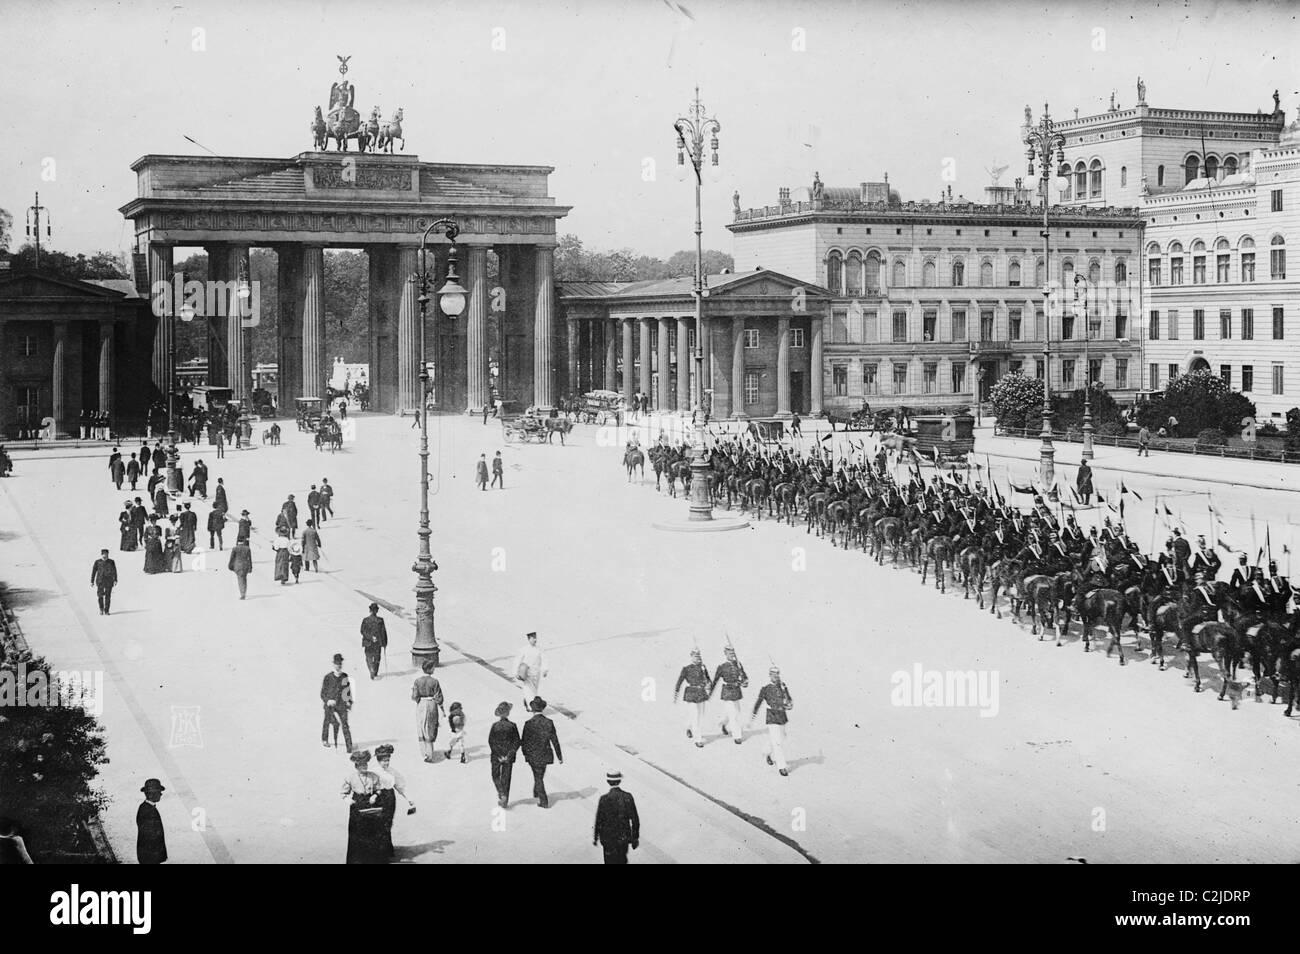 Pariser Platz and Brandenburger Thor (Paris Place and Brandenburg Gate) - Stock Image